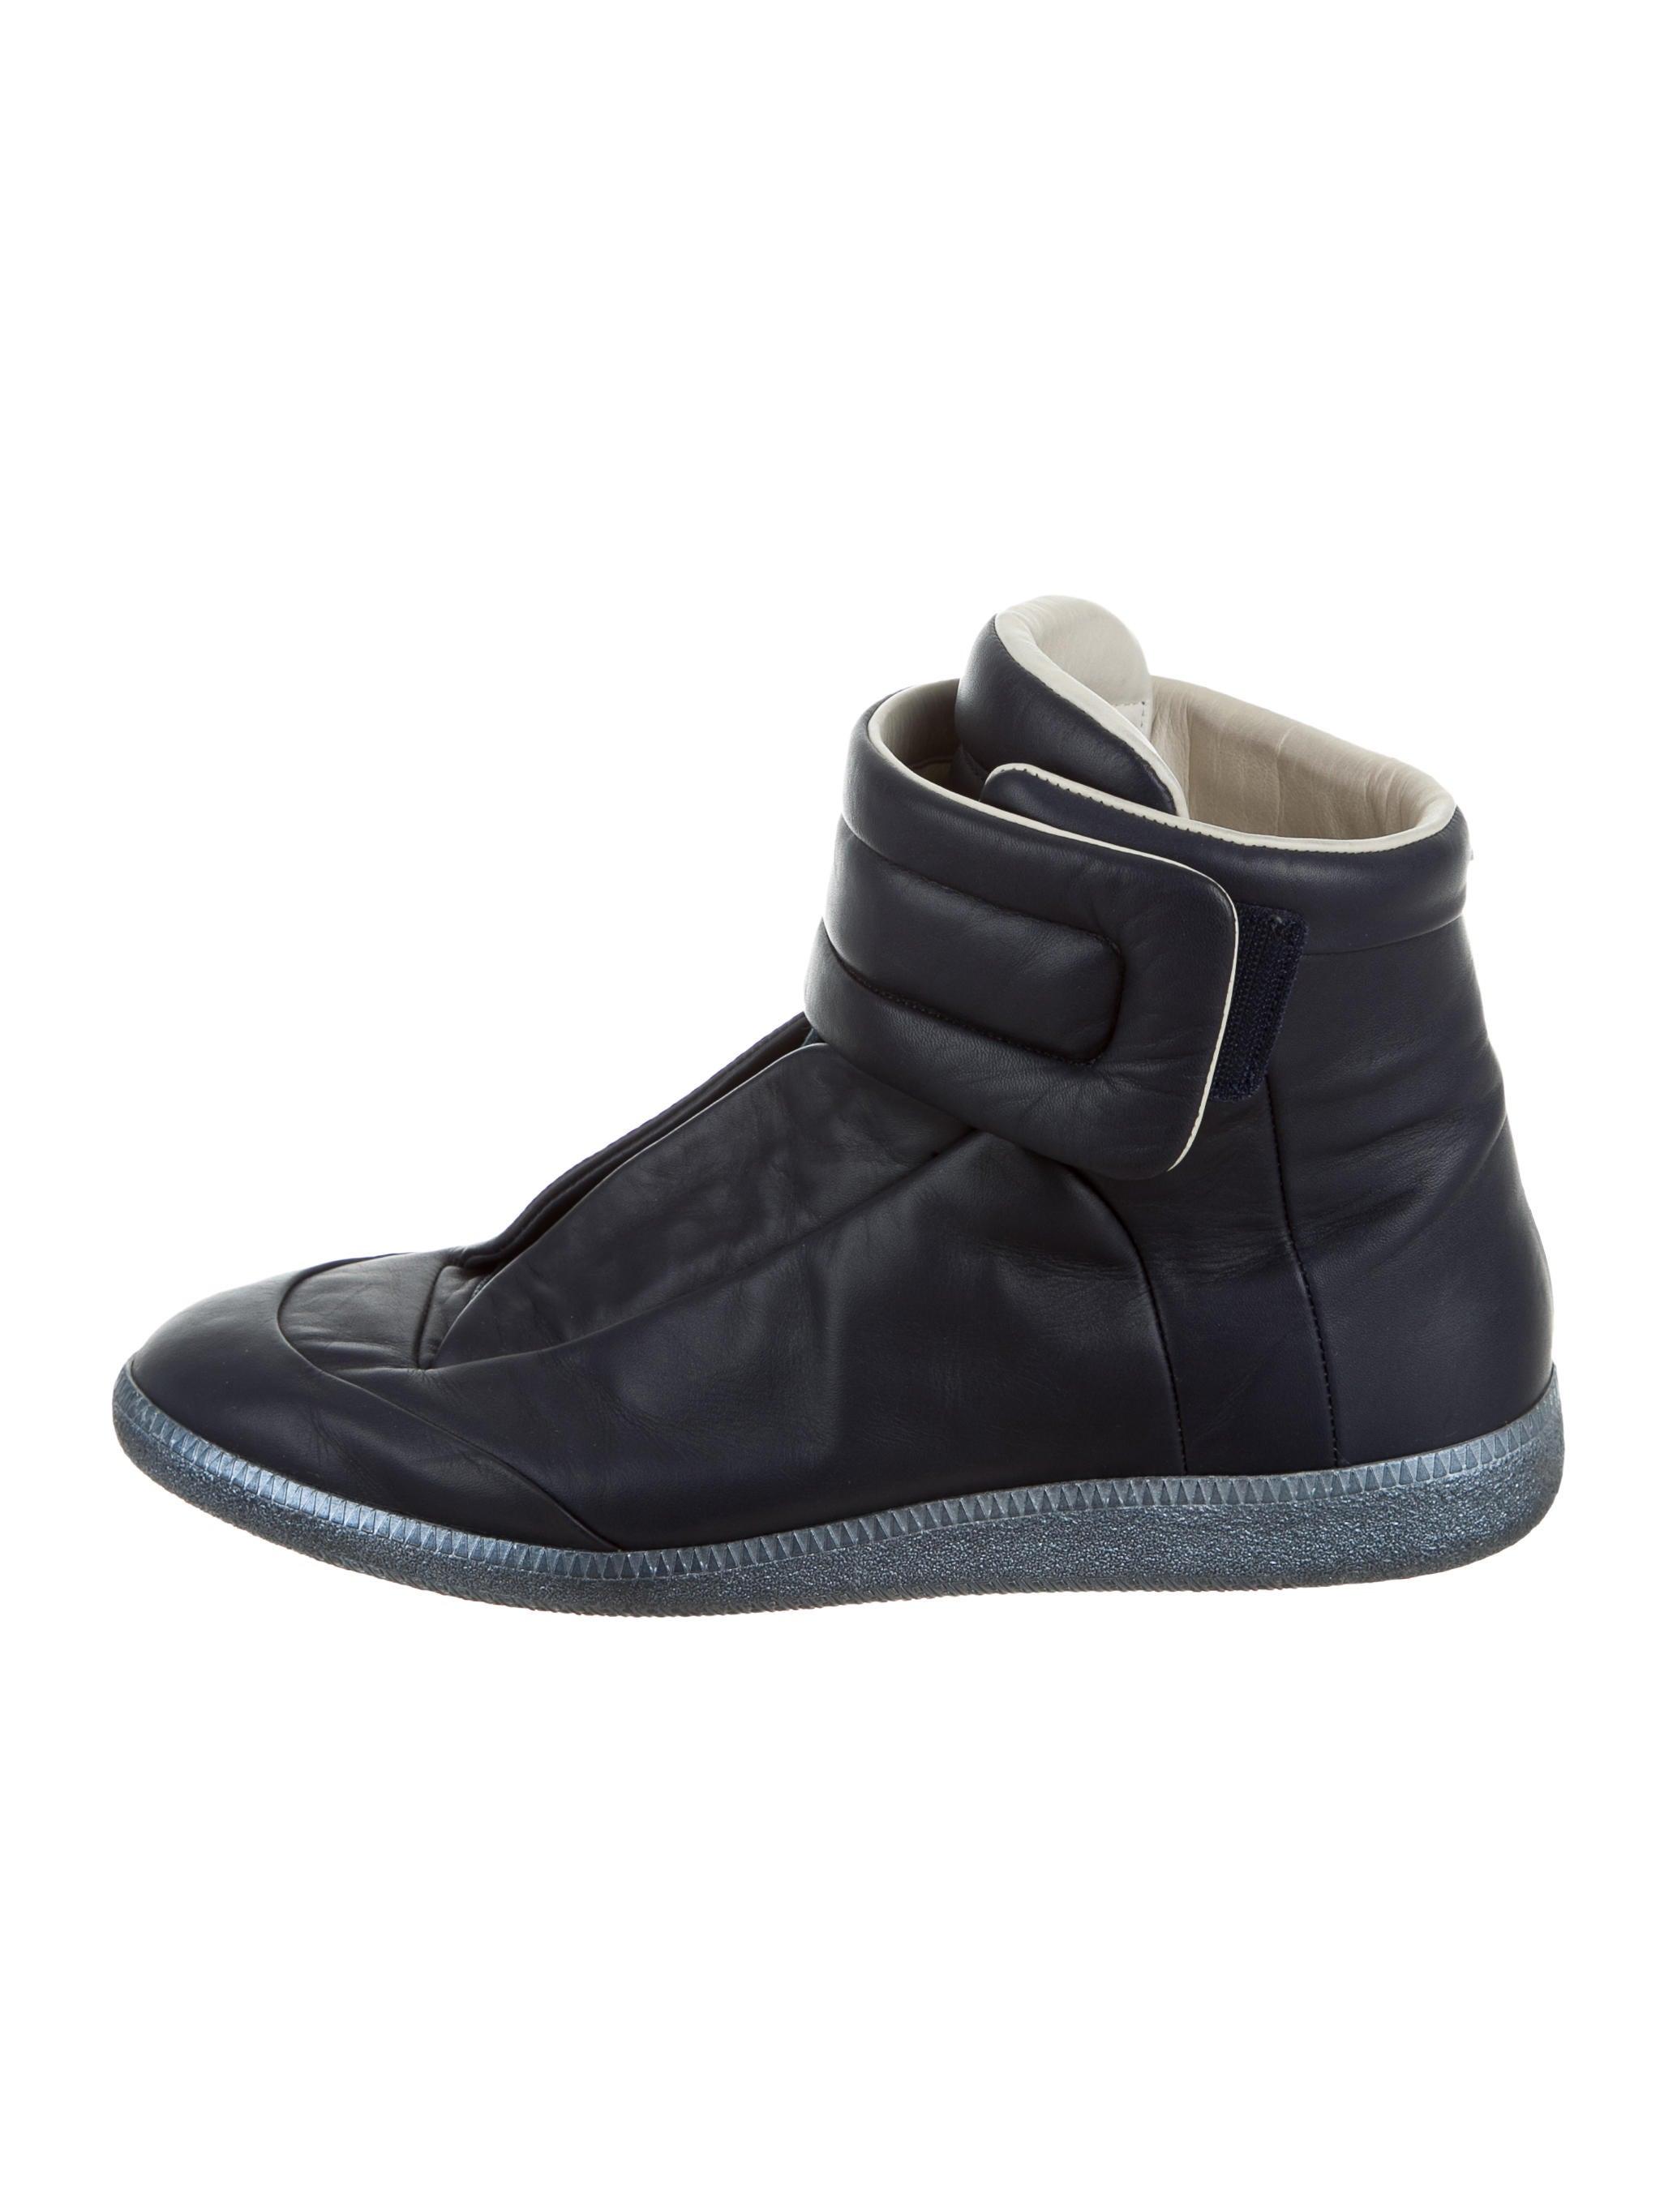 maison margiela future leather sneakers shoes mai29224 the realreal. Black Bedroom Furniture Sets. Home Design Ideas